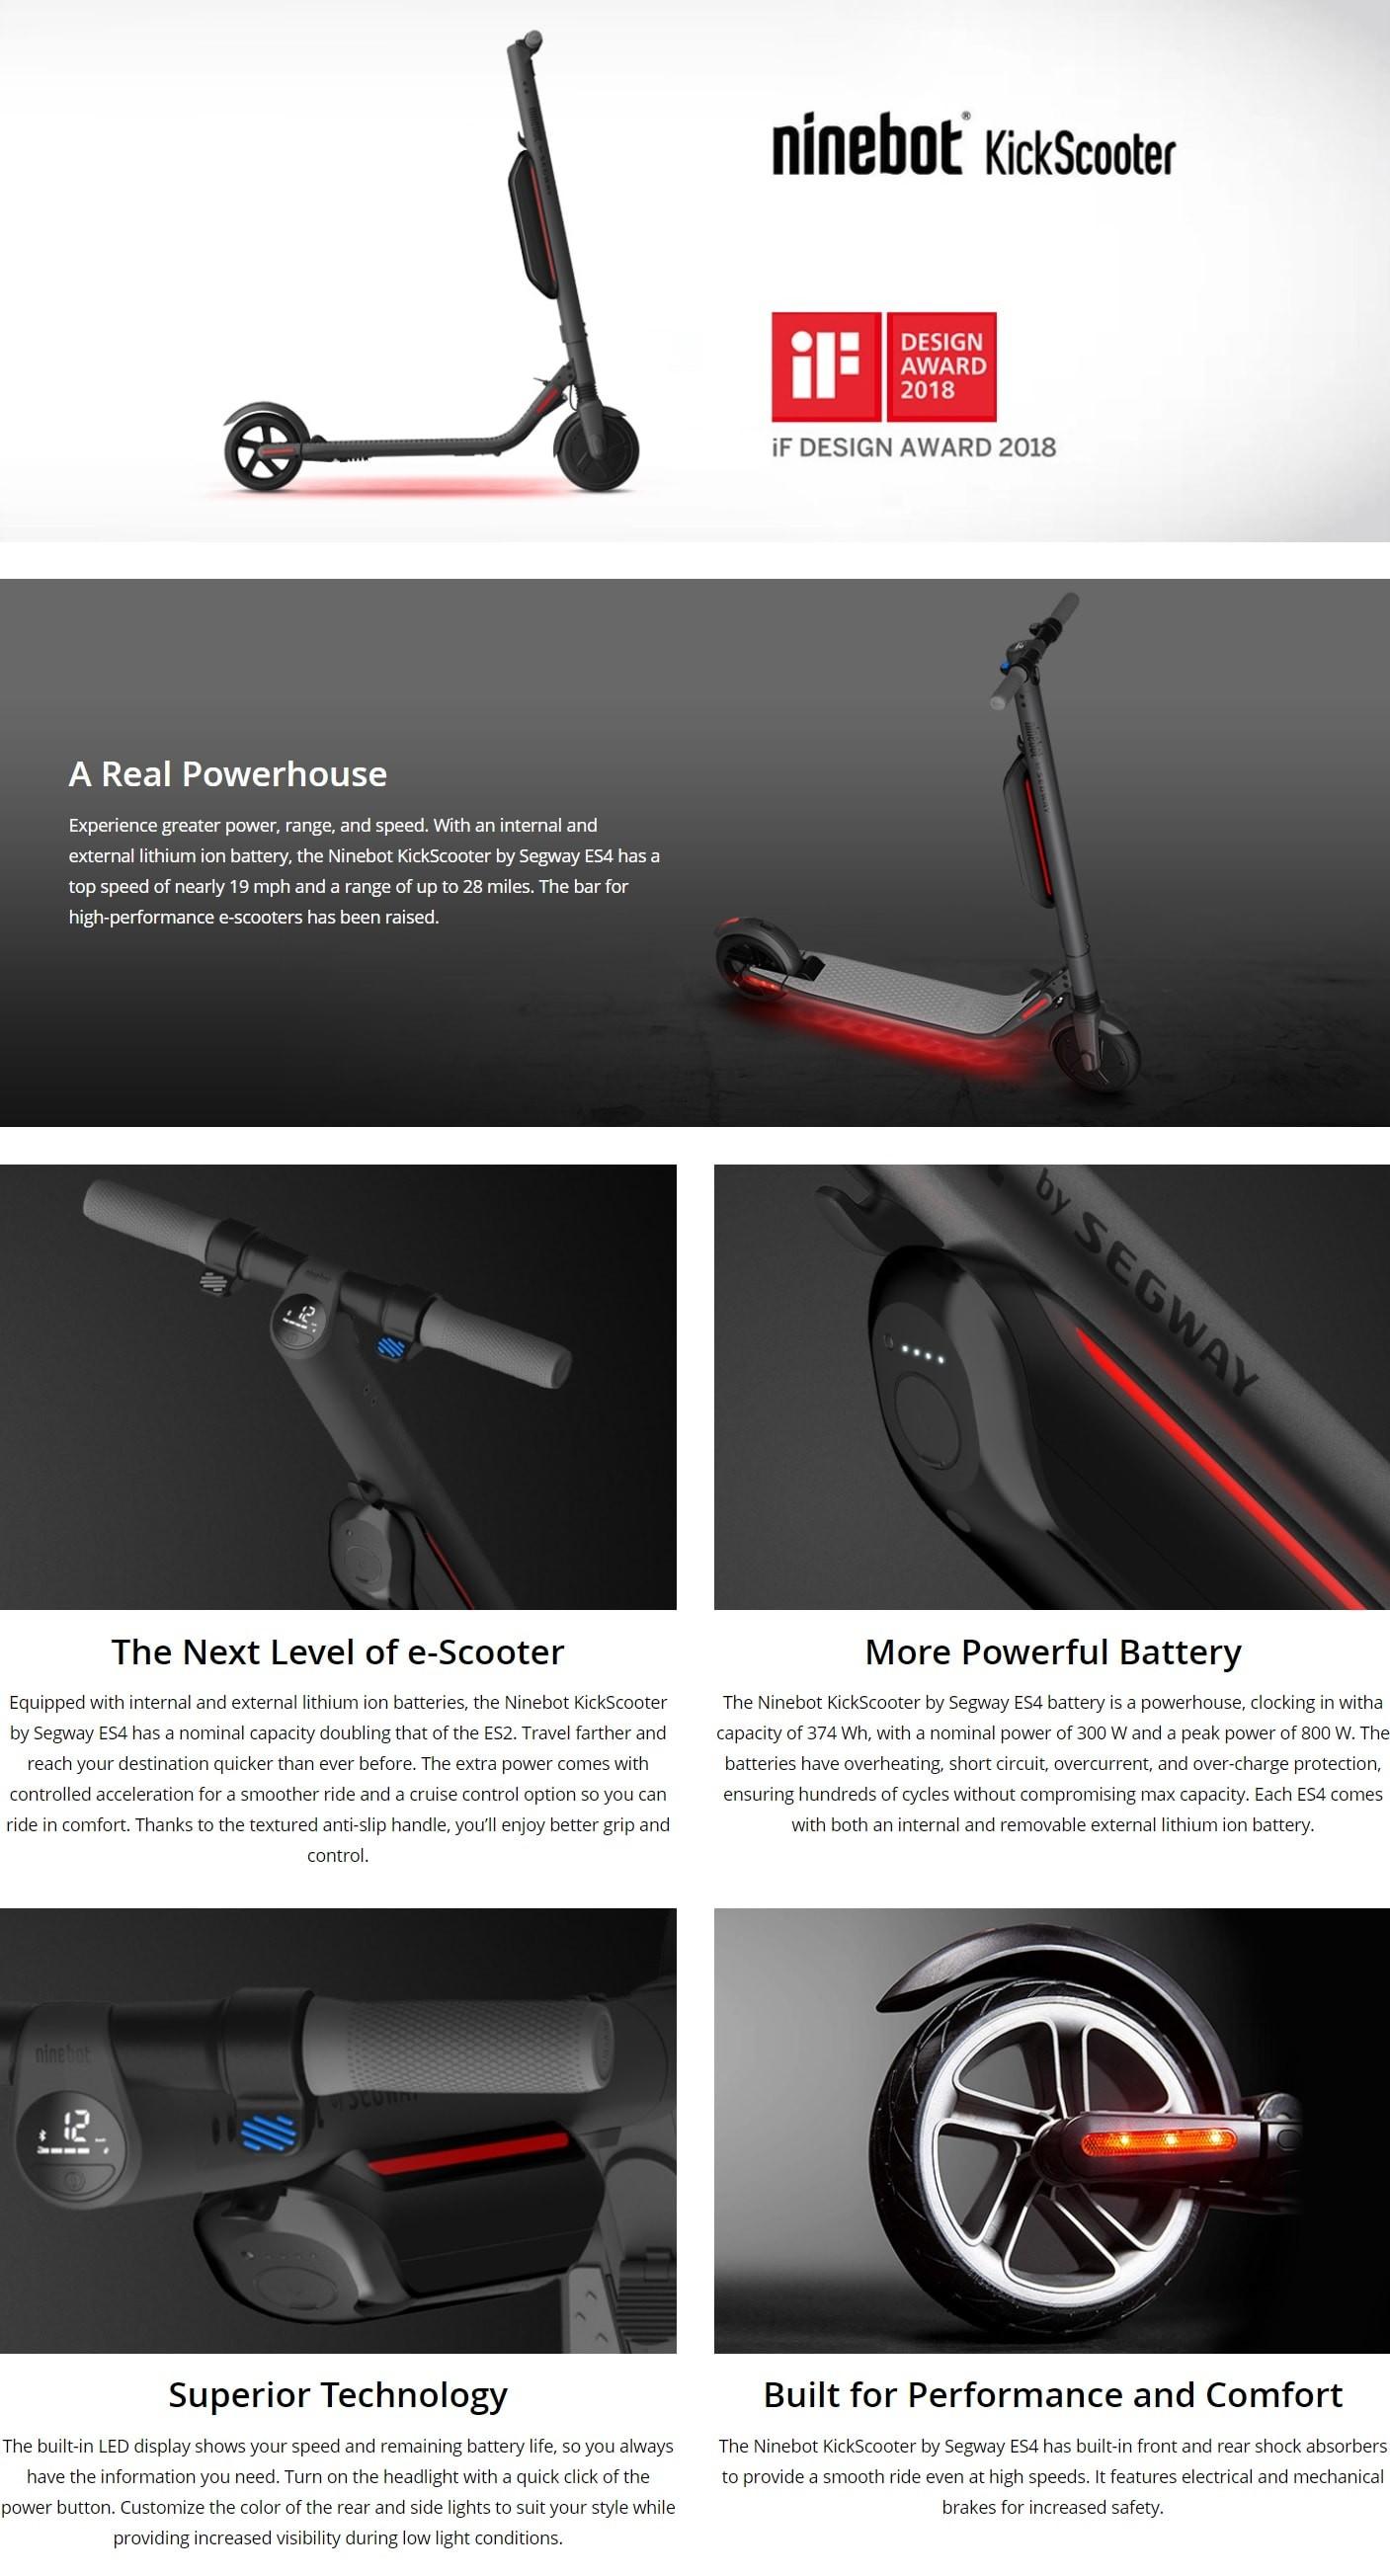 Prezentare-Xiaomi-Ninebot-Segway-Kickscooter-ES47d064a96bffb0110.jpg